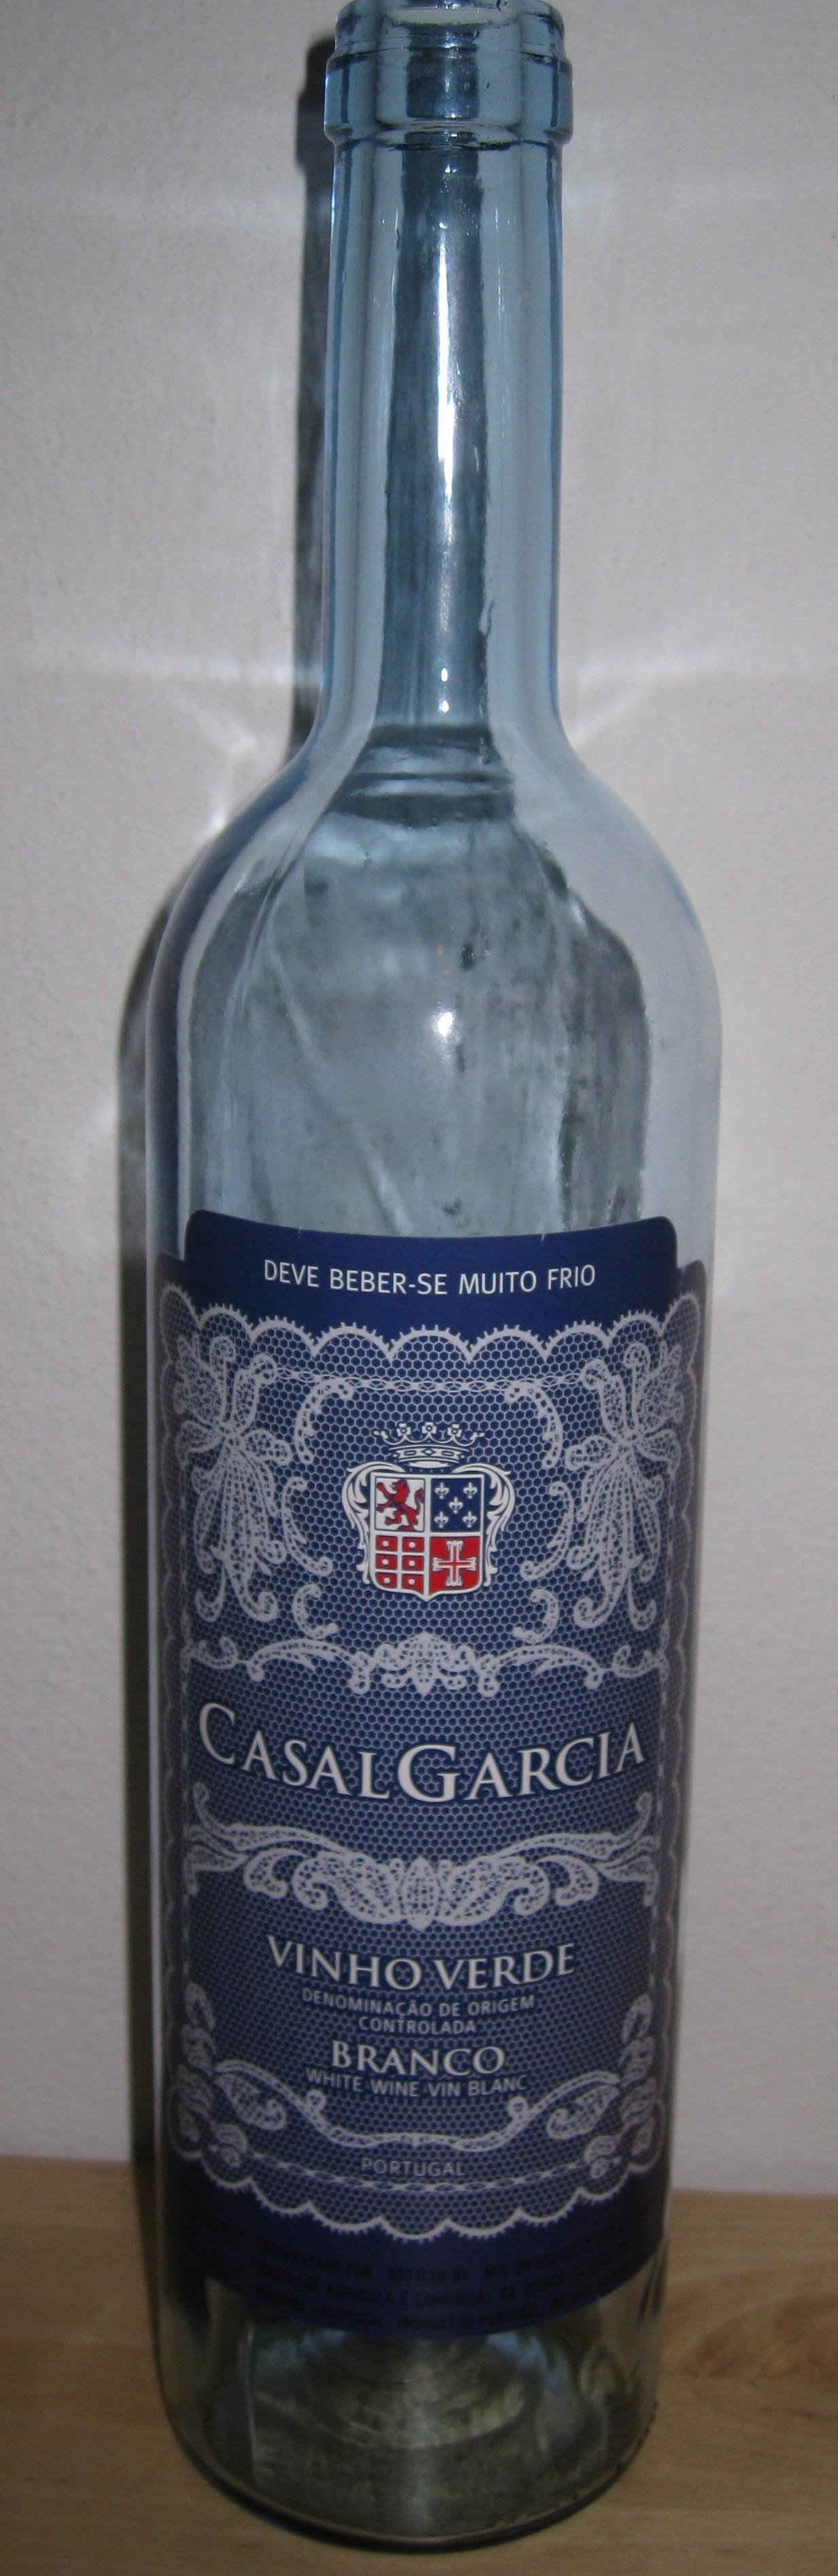 Vinho Verde – Casal Garcia